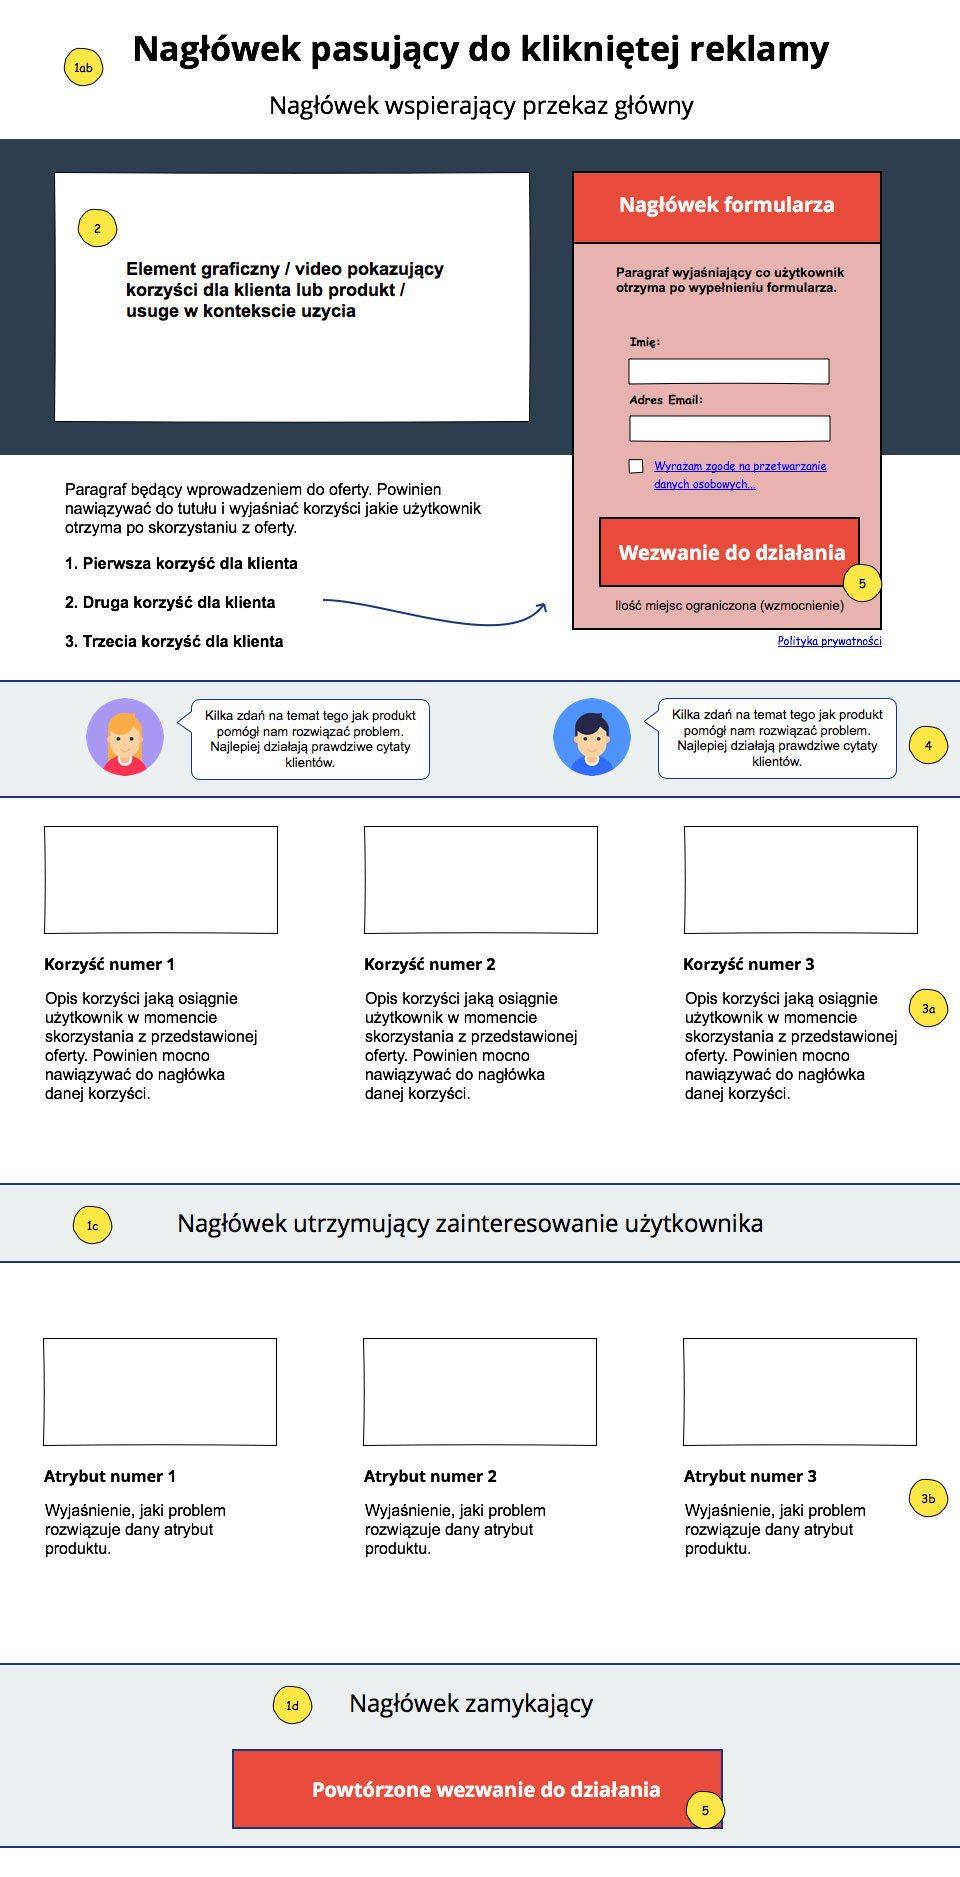 makieta landing page zrob.dobrylanding.pl